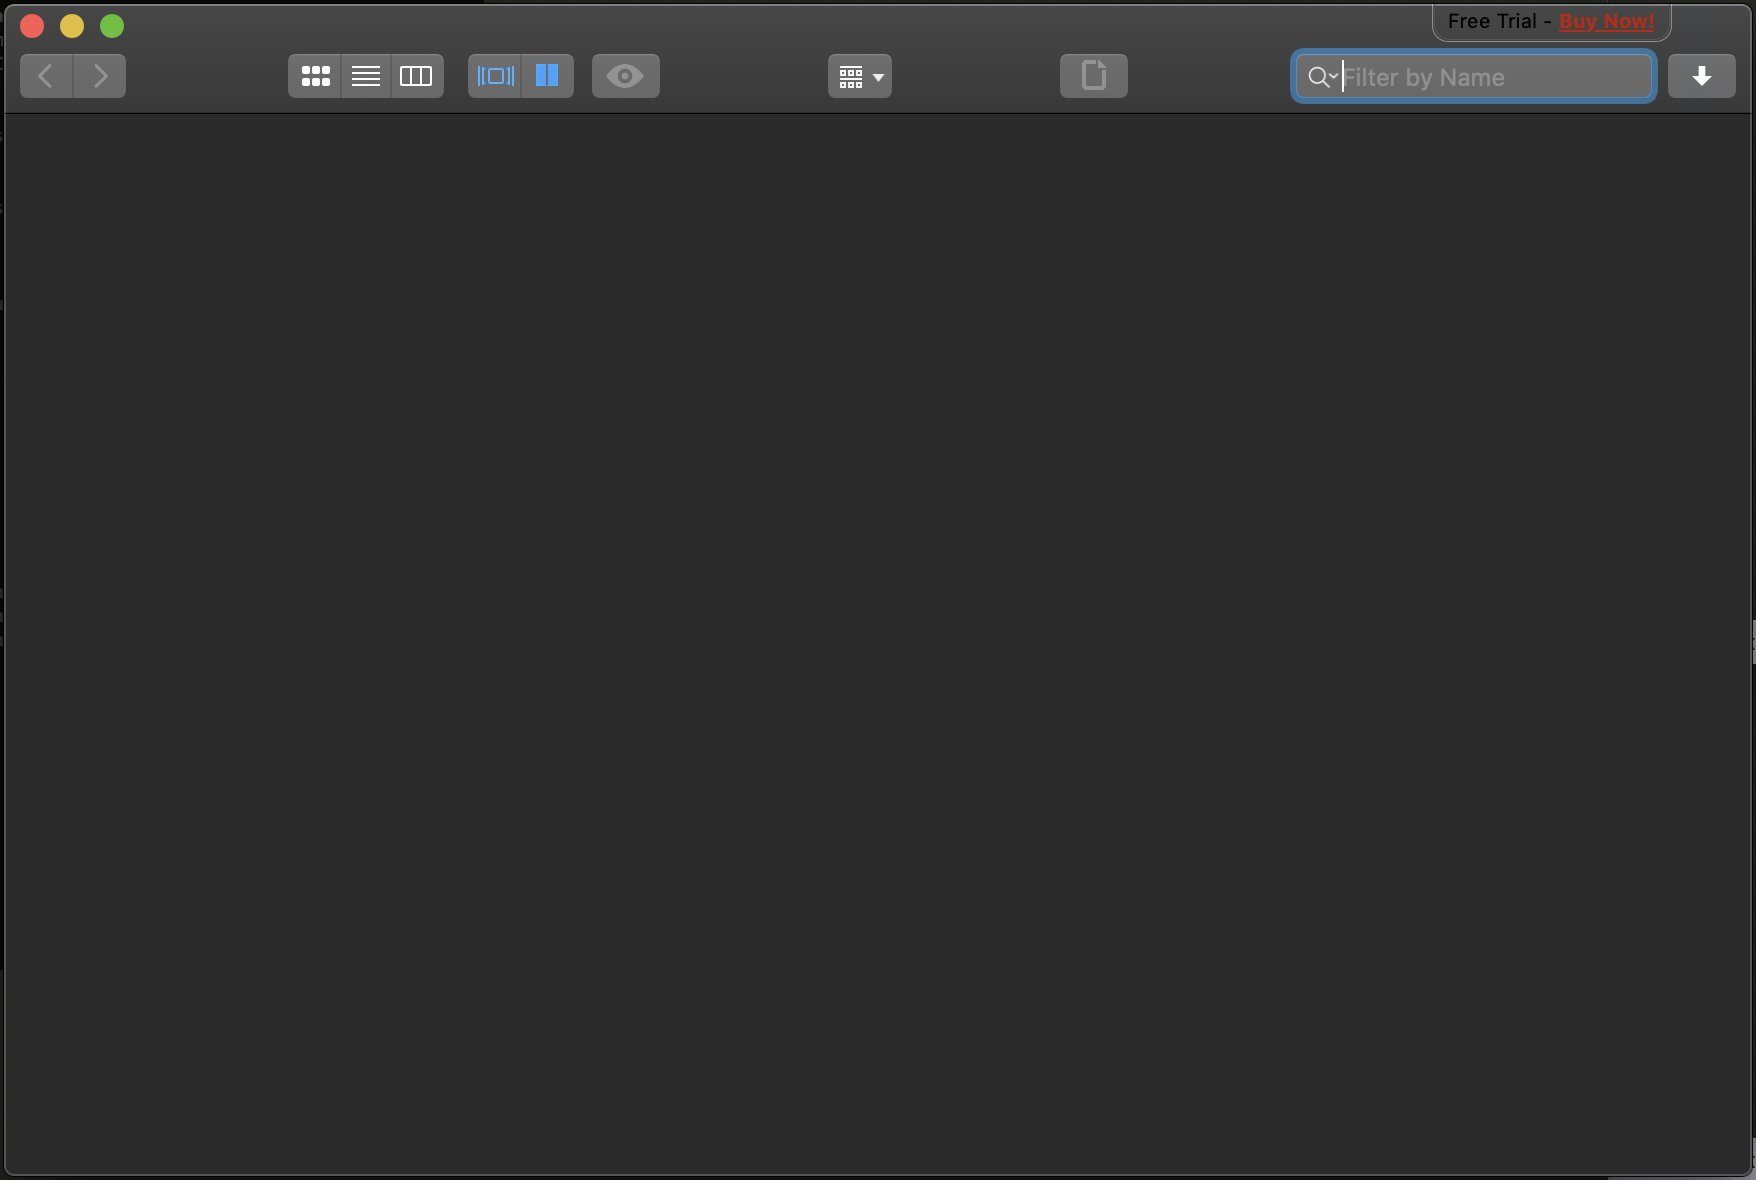 v8 3 3 + Mac OS 10 14 [0,1] (18B75)] Blank window on startup